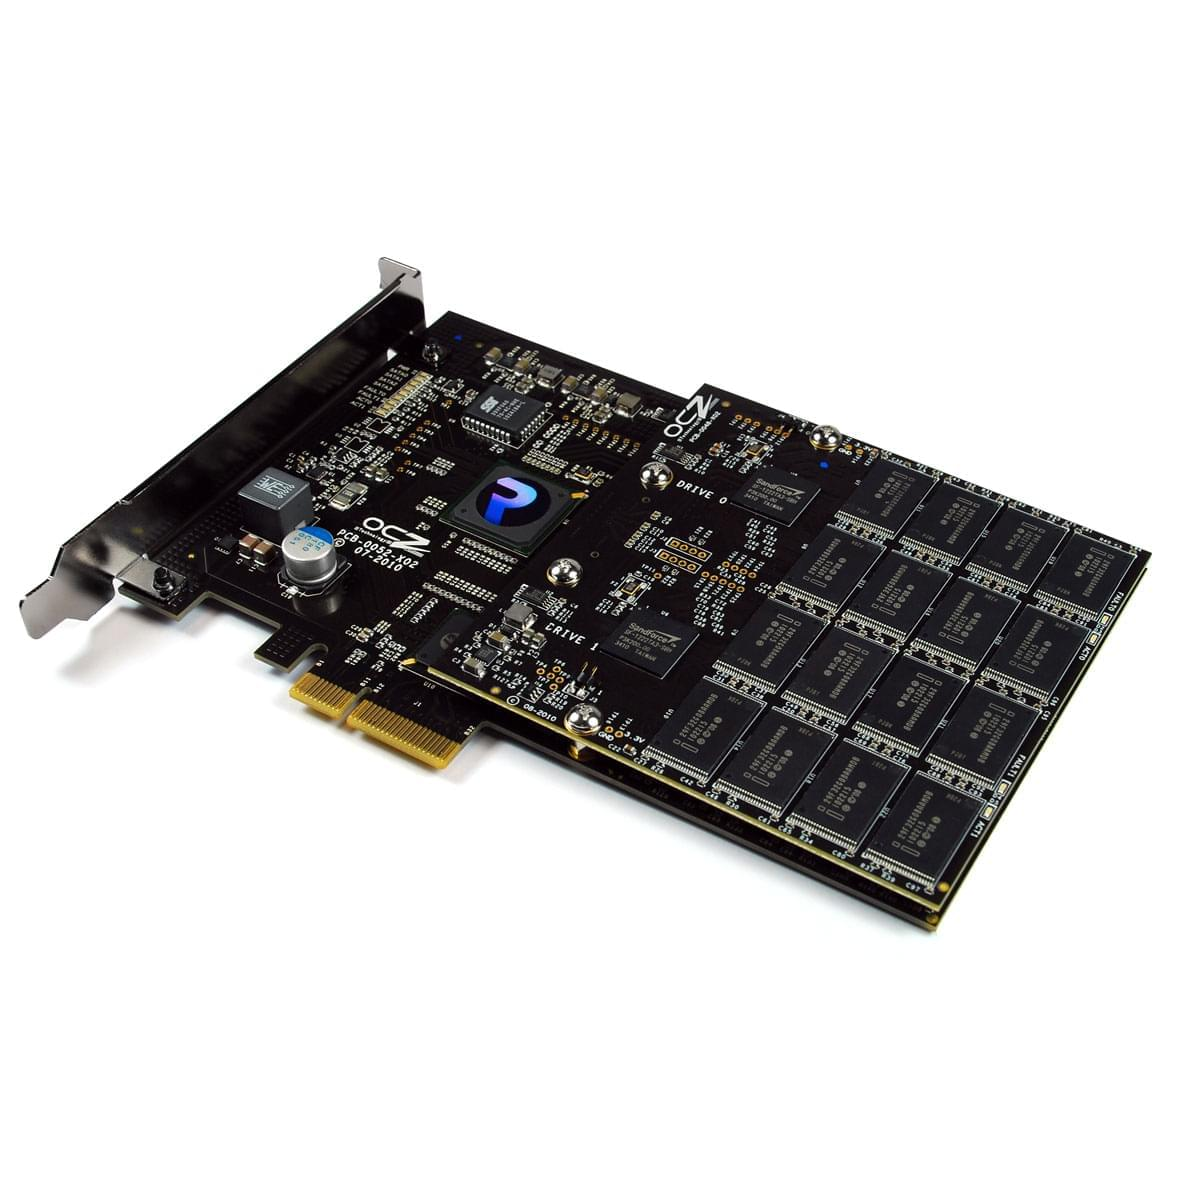 "OCZ 160Go RevoDrive OCZSSDPX-1RVDX0160 PCI-E (OCZSSDPX-1RVDX0160) - Achat / Vente Disque Dur interne 3.5"" sur Cybertek.fr - 0"